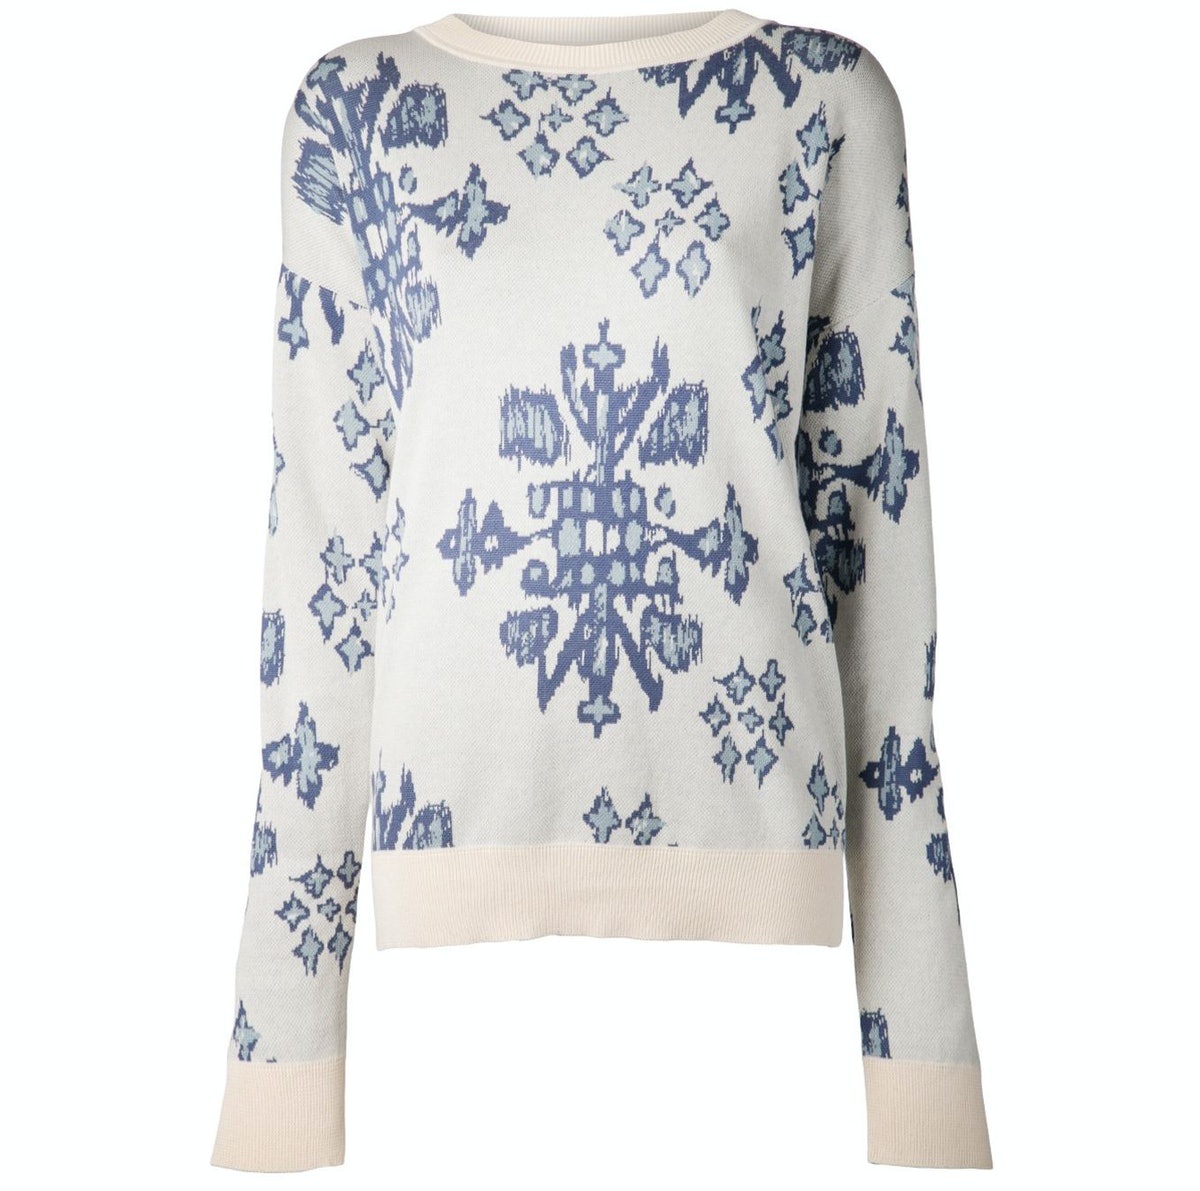 BaJa East sweater